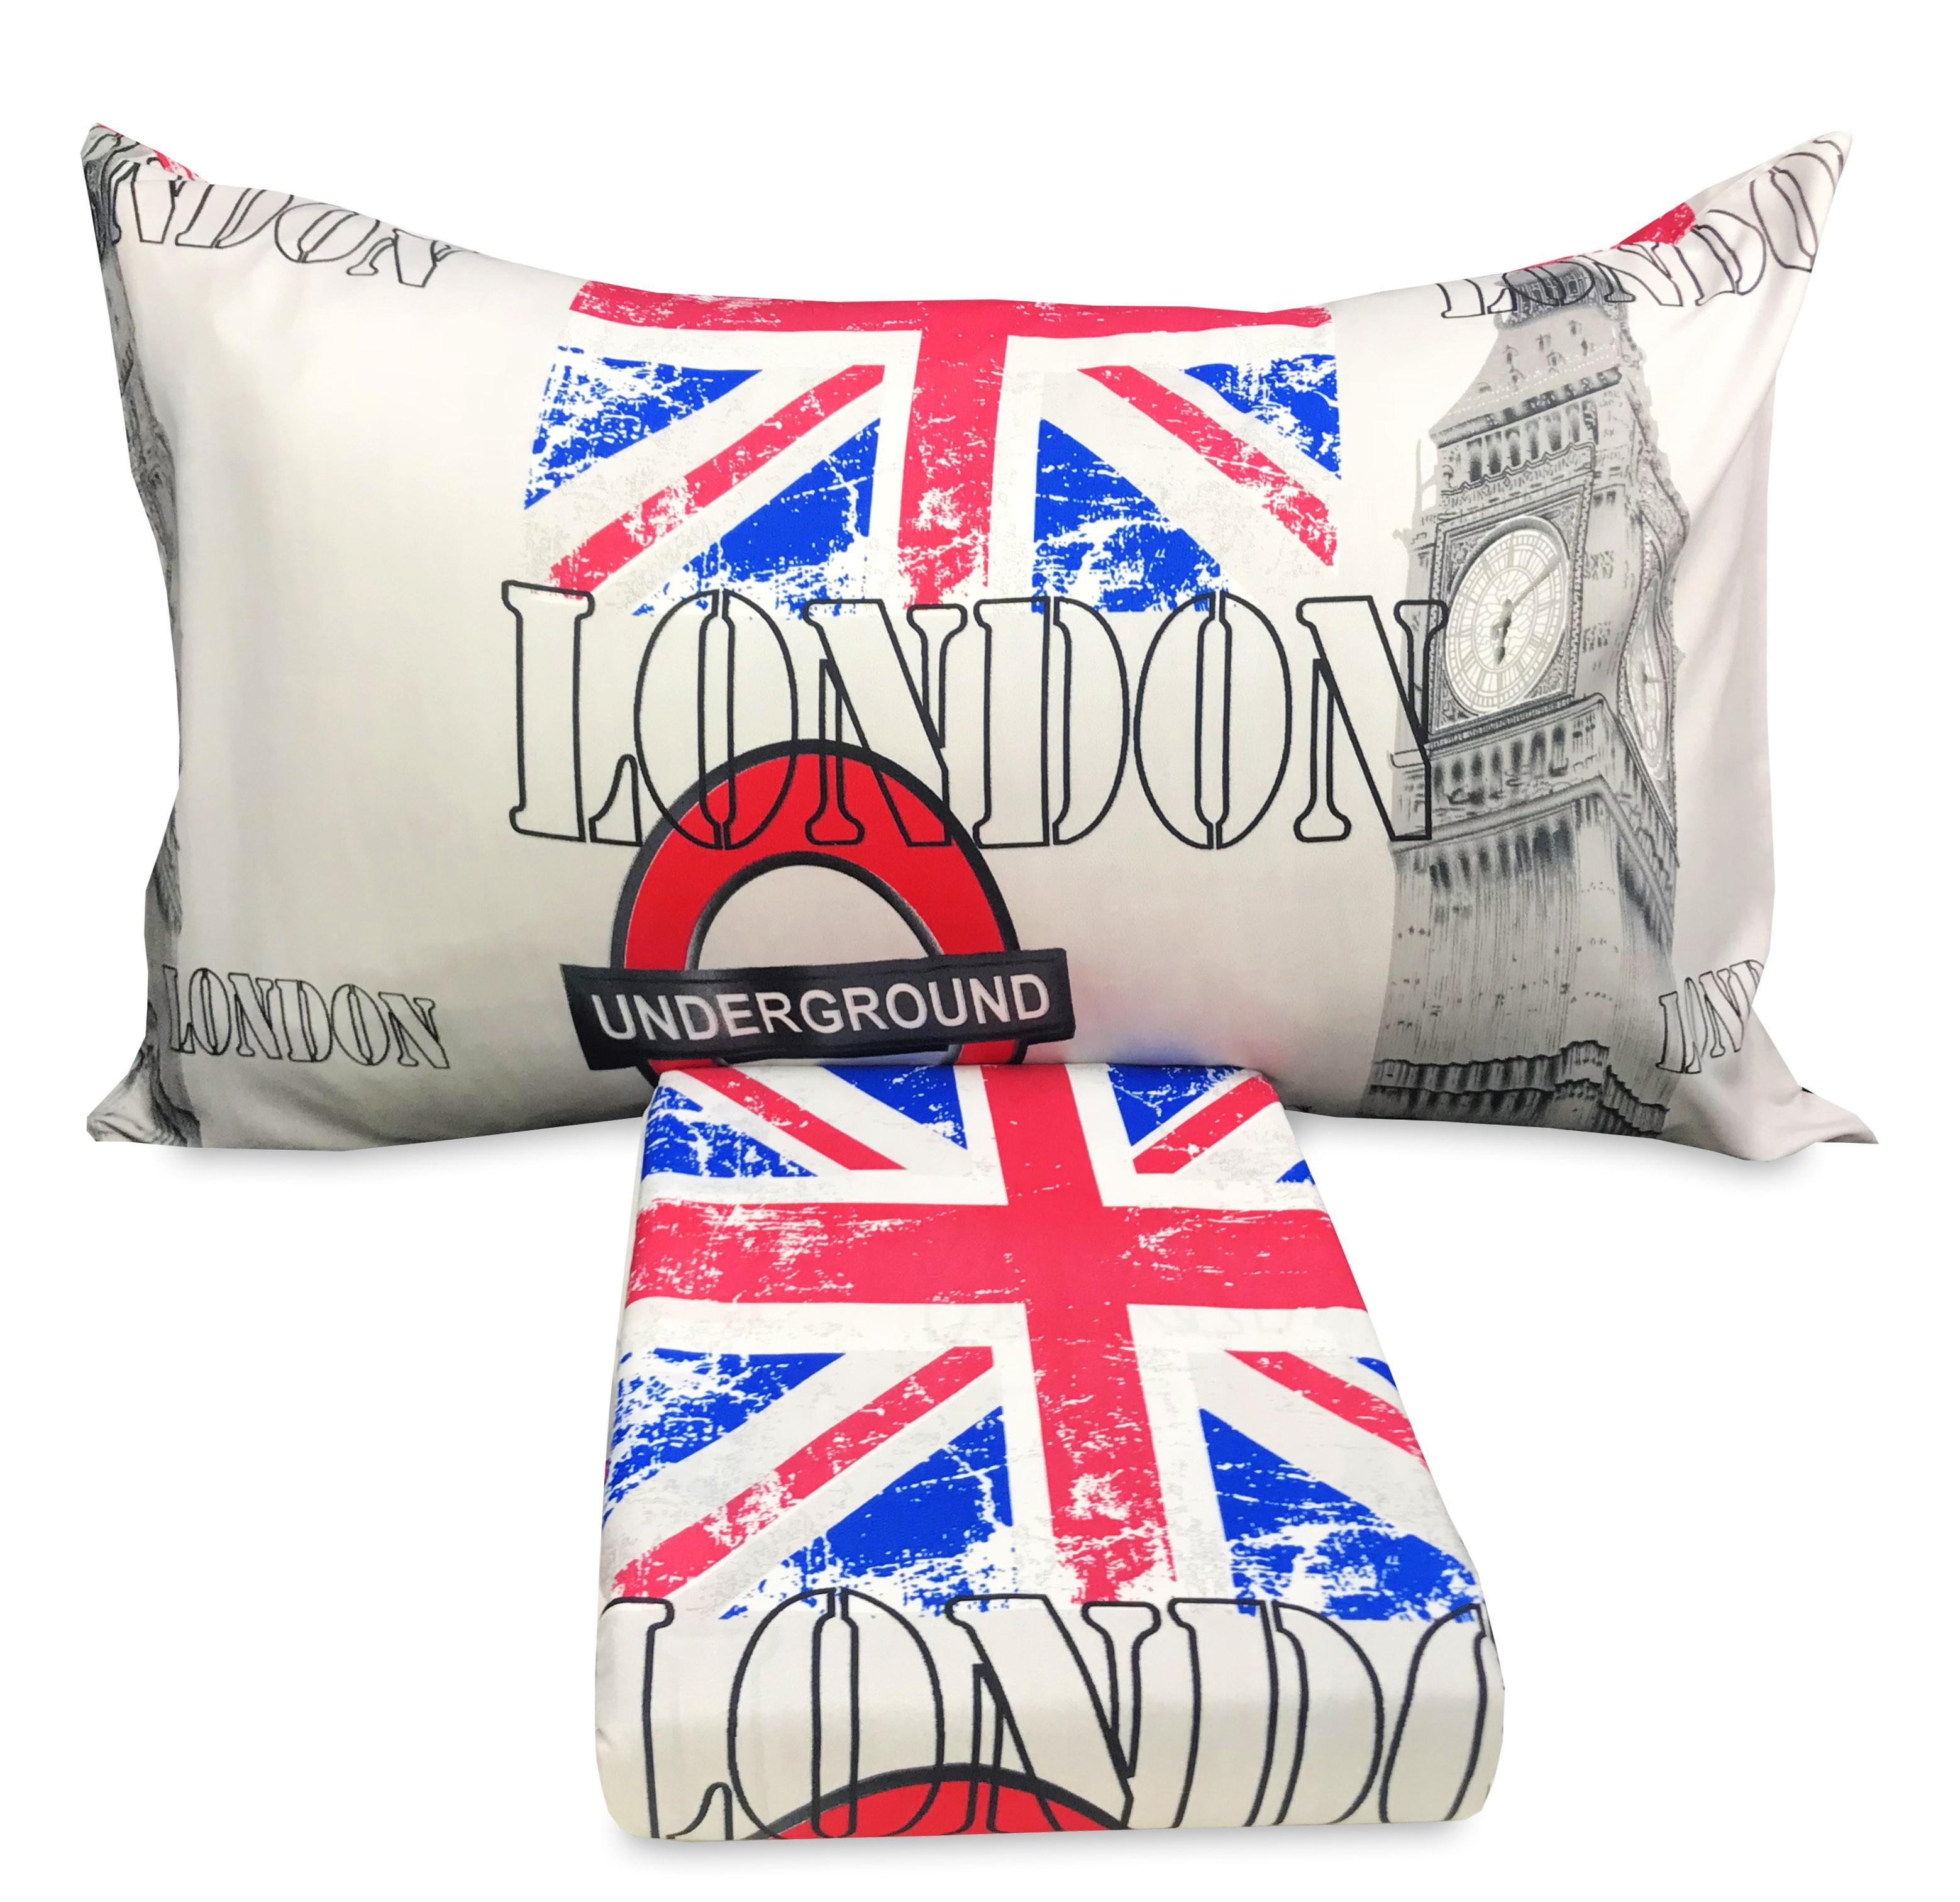 Copripiumino Inglese.Copripiumino Londra Inglese Cabina Big Ben Underground Competo Di